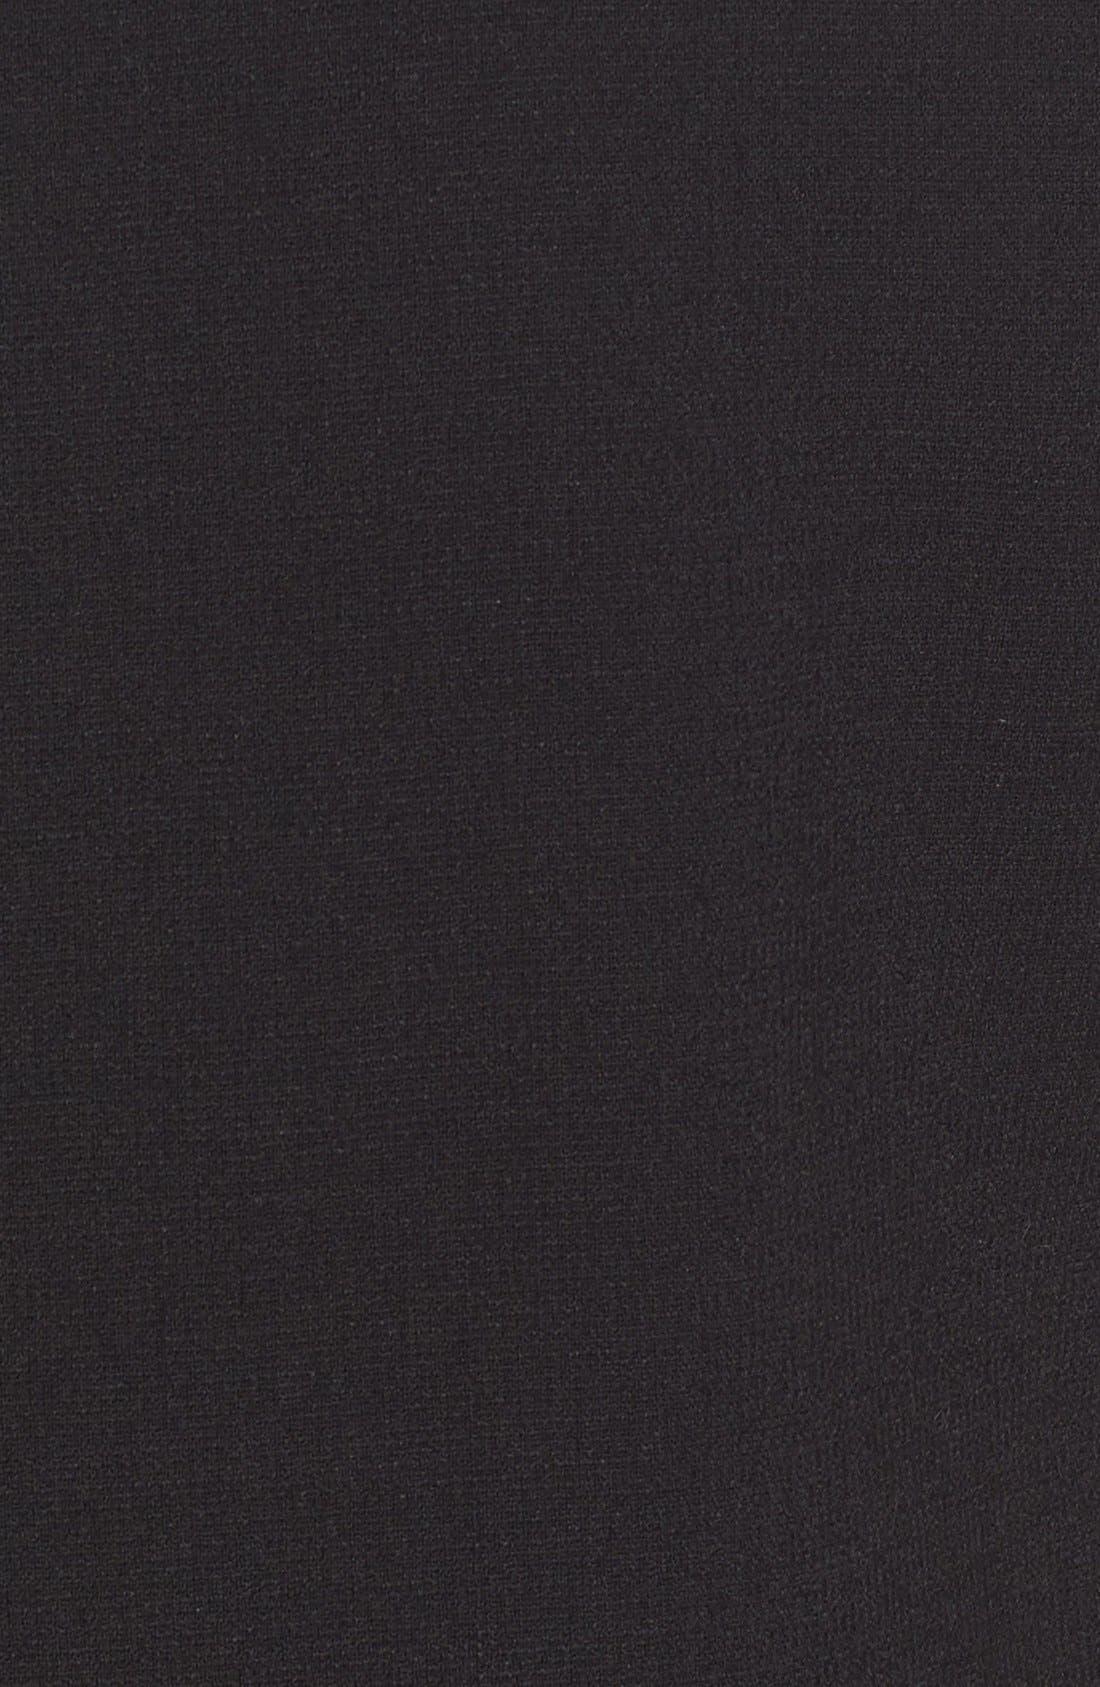 Alternate Image 3  - Dolce&Gabbana Cat Appliqué Wool Blend Crepe Dress